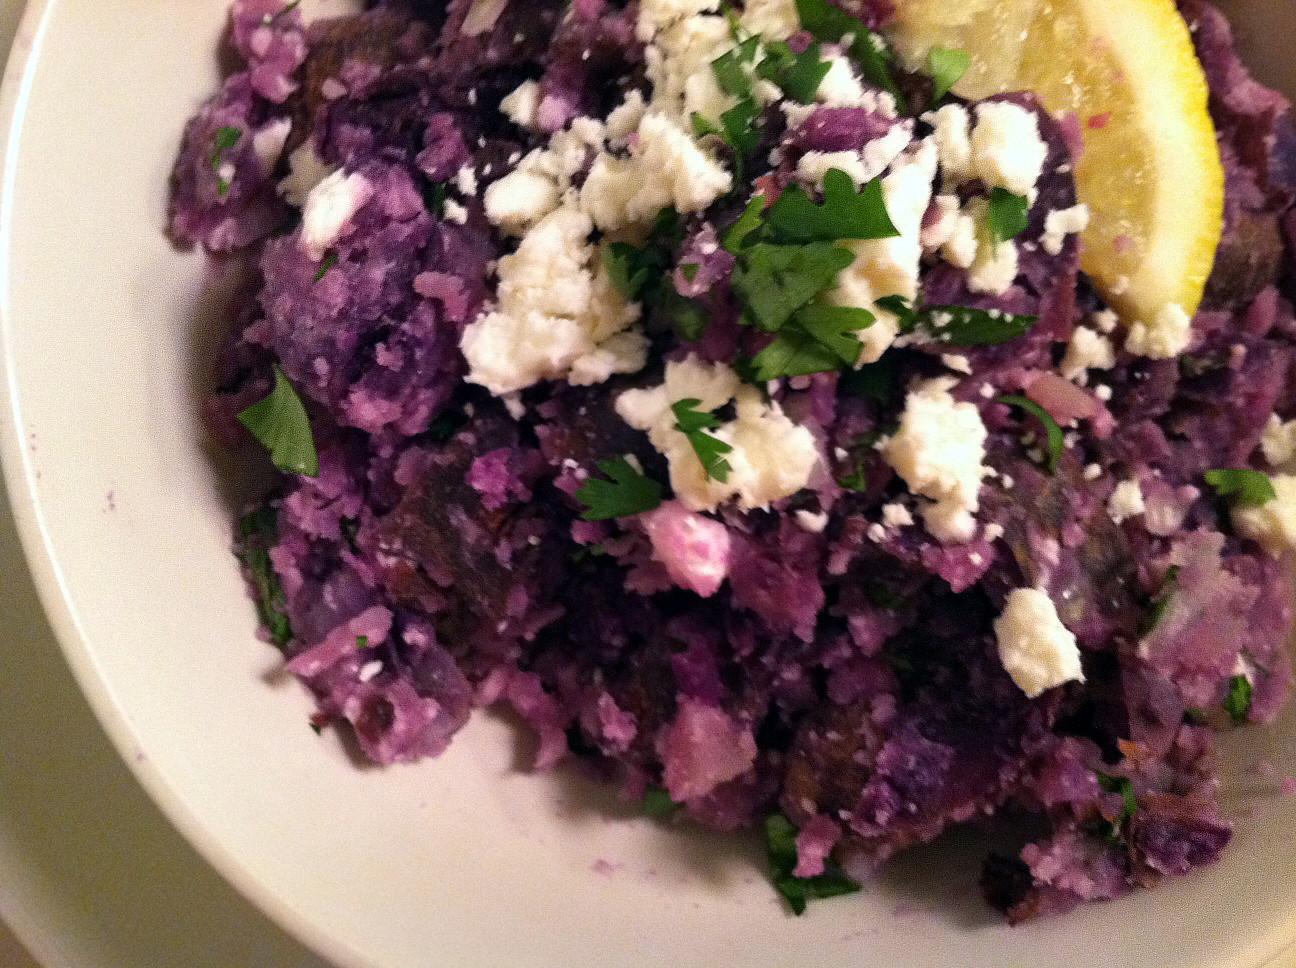 Purple Potato Recipe  Making Home Homemade Two Purple Potato Recipes